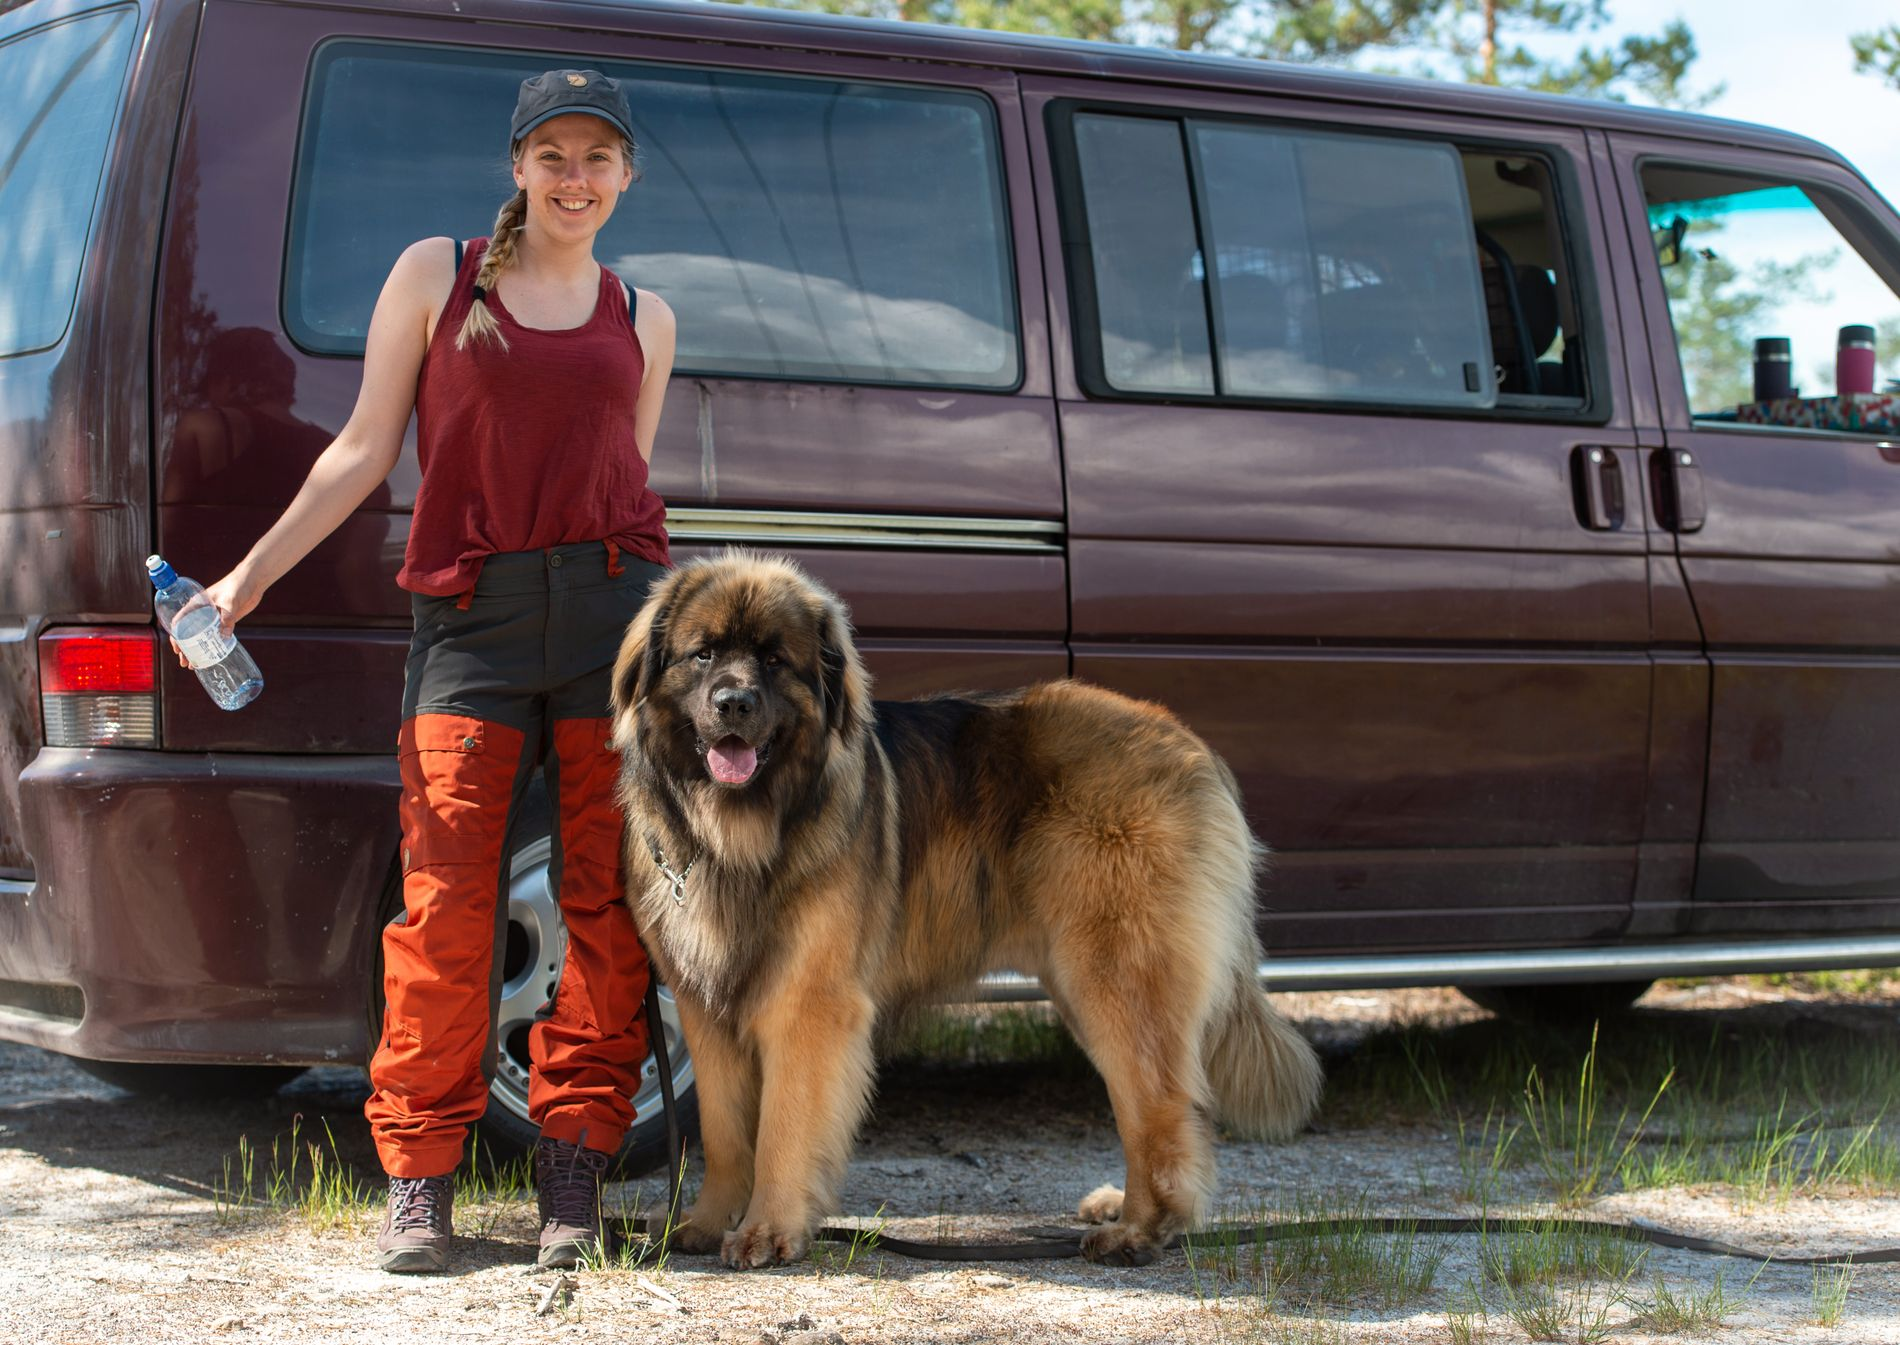 TURGLAD: Maren Ueland (28) sammen med hunden Alf Herman.